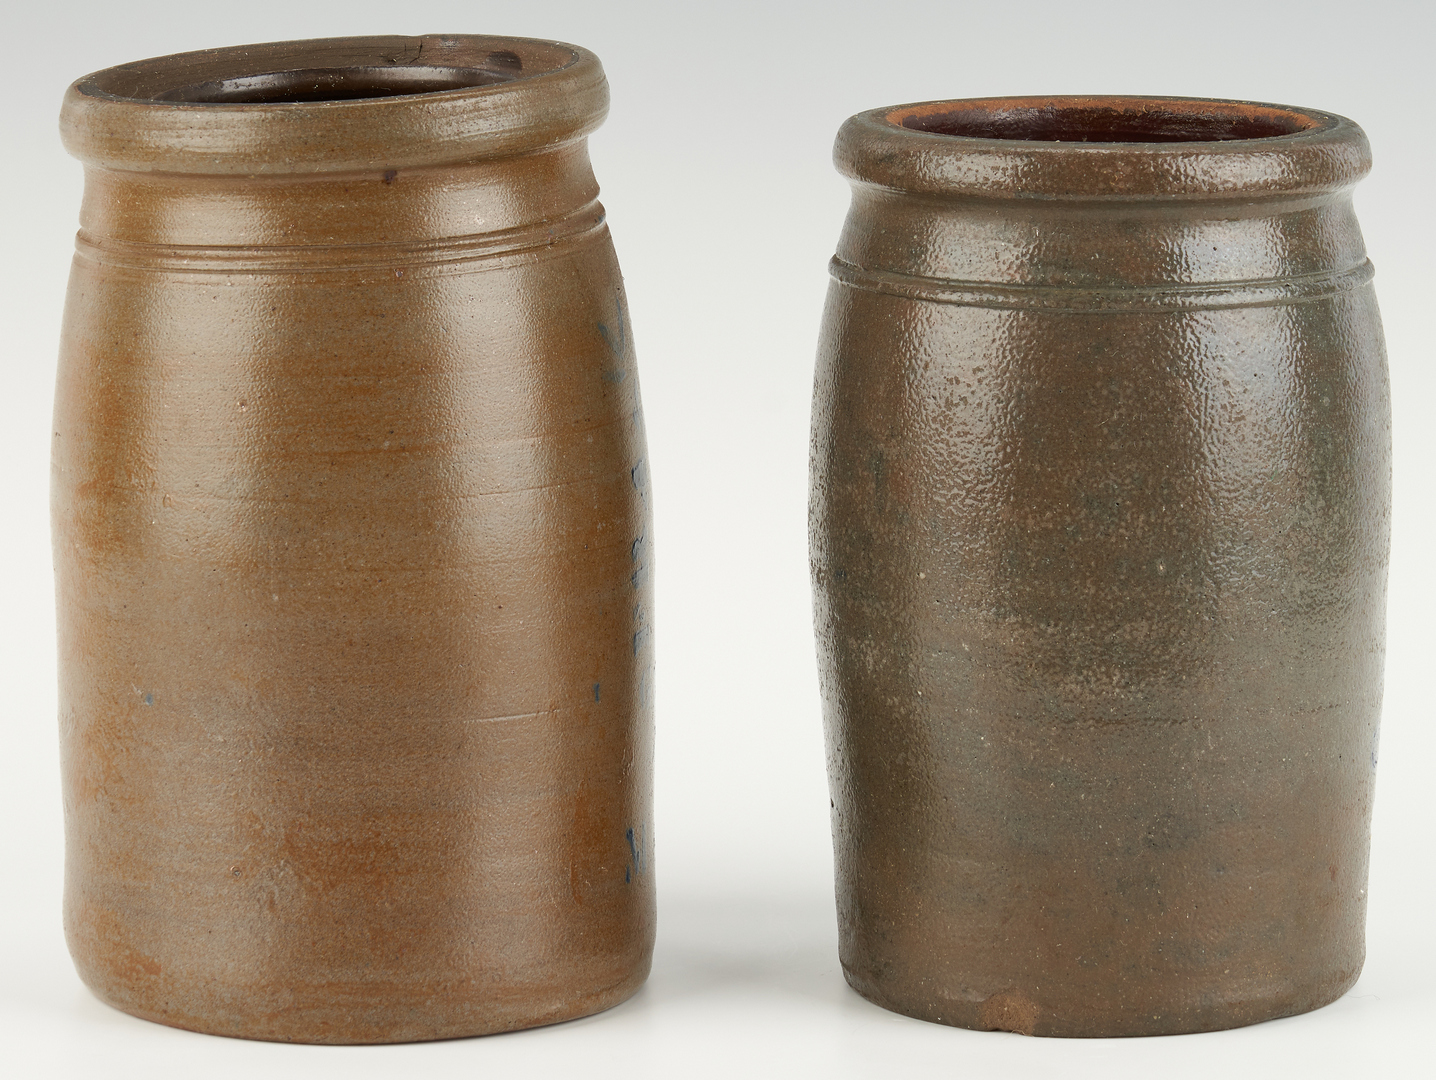 Lot 460: 2 W. VA Stoneware Jars, incl. Frazier, Staats